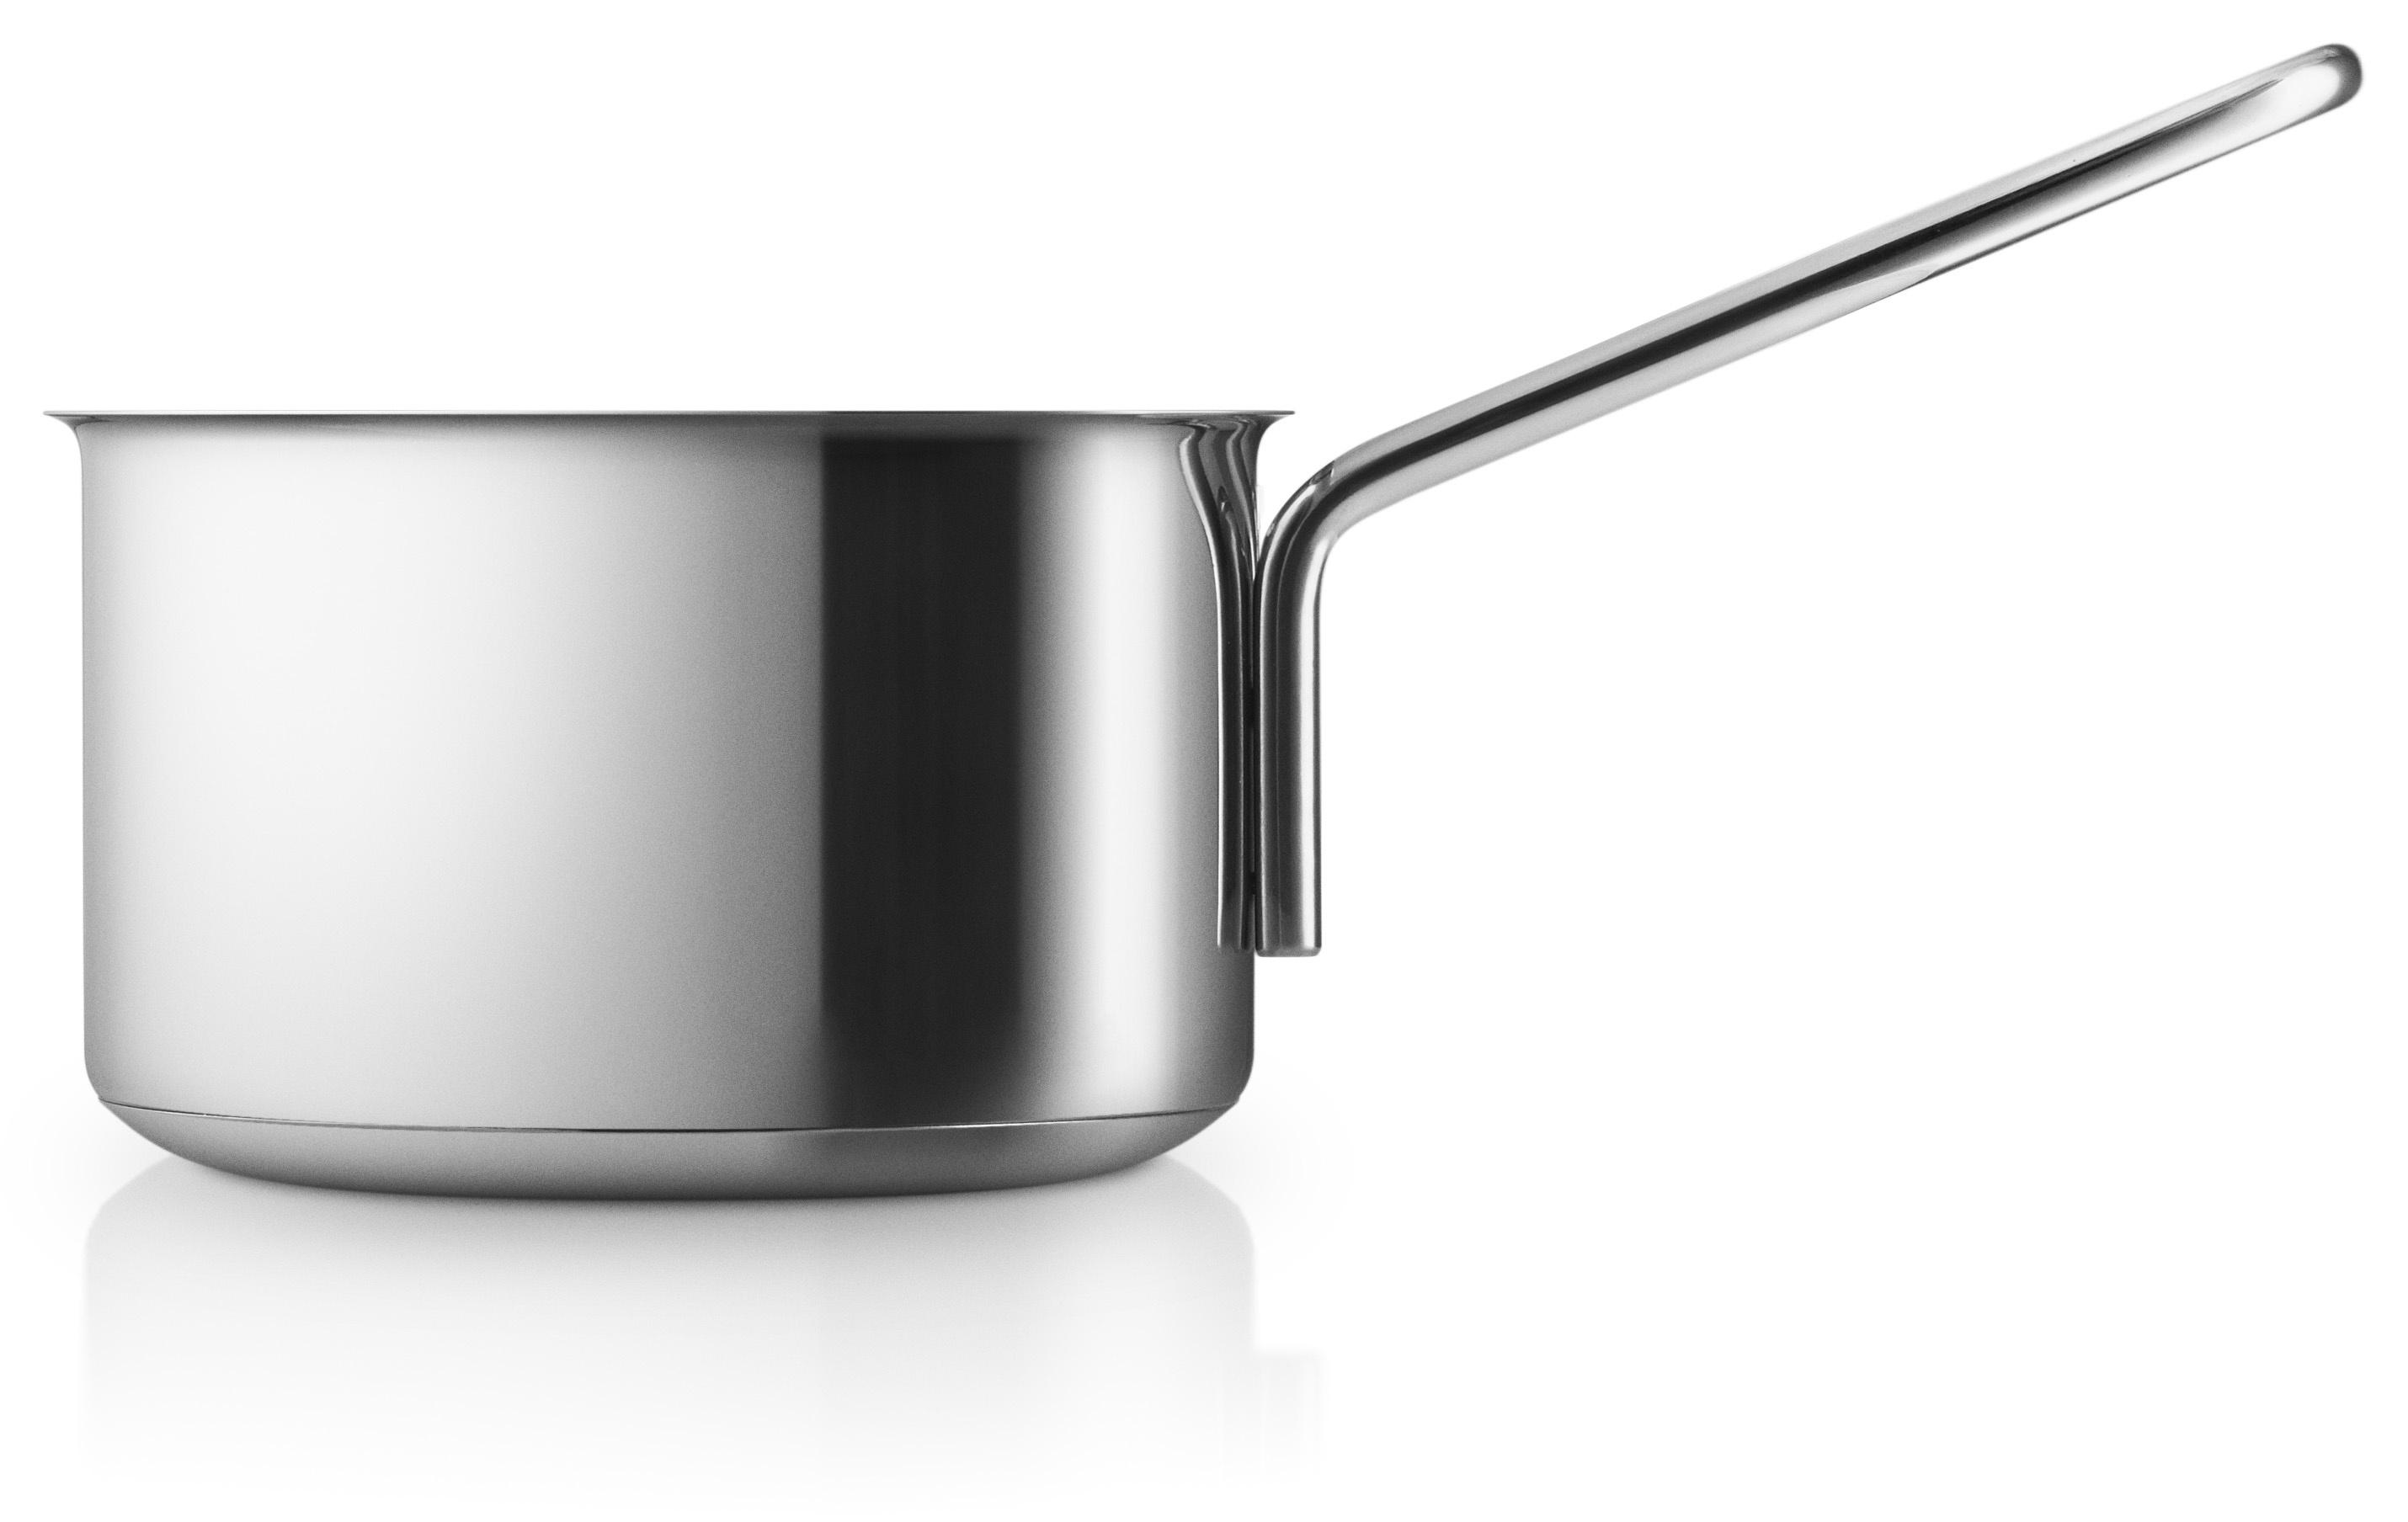 Eva Trio Rustfri stål kasserolle, 1,1 liter